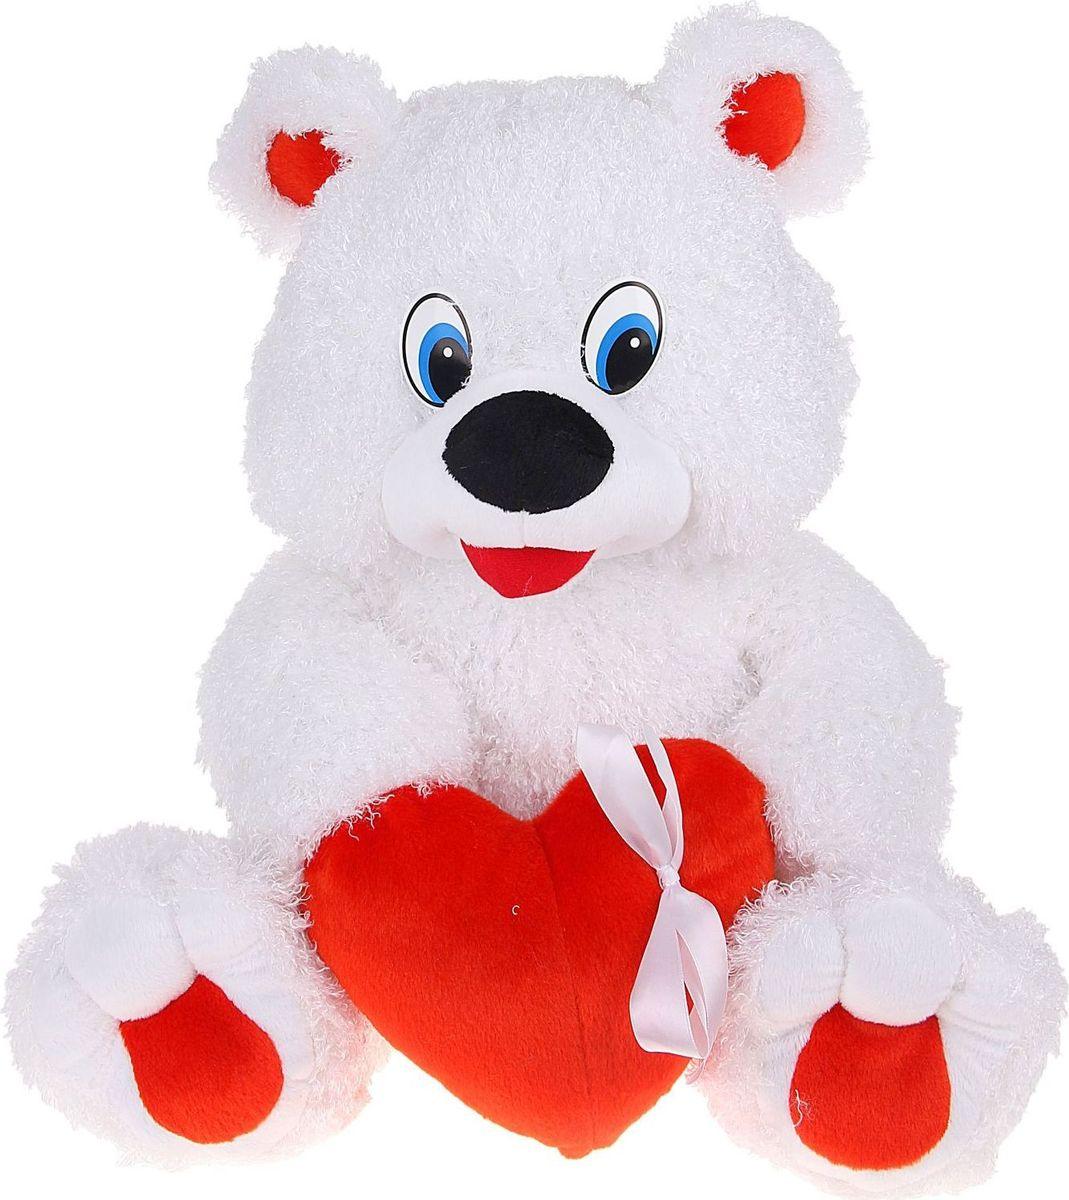 Sima-land Мягкая игрушка Медвежонок Романтик 52 см sima land мягкая игрушка сердце 309576